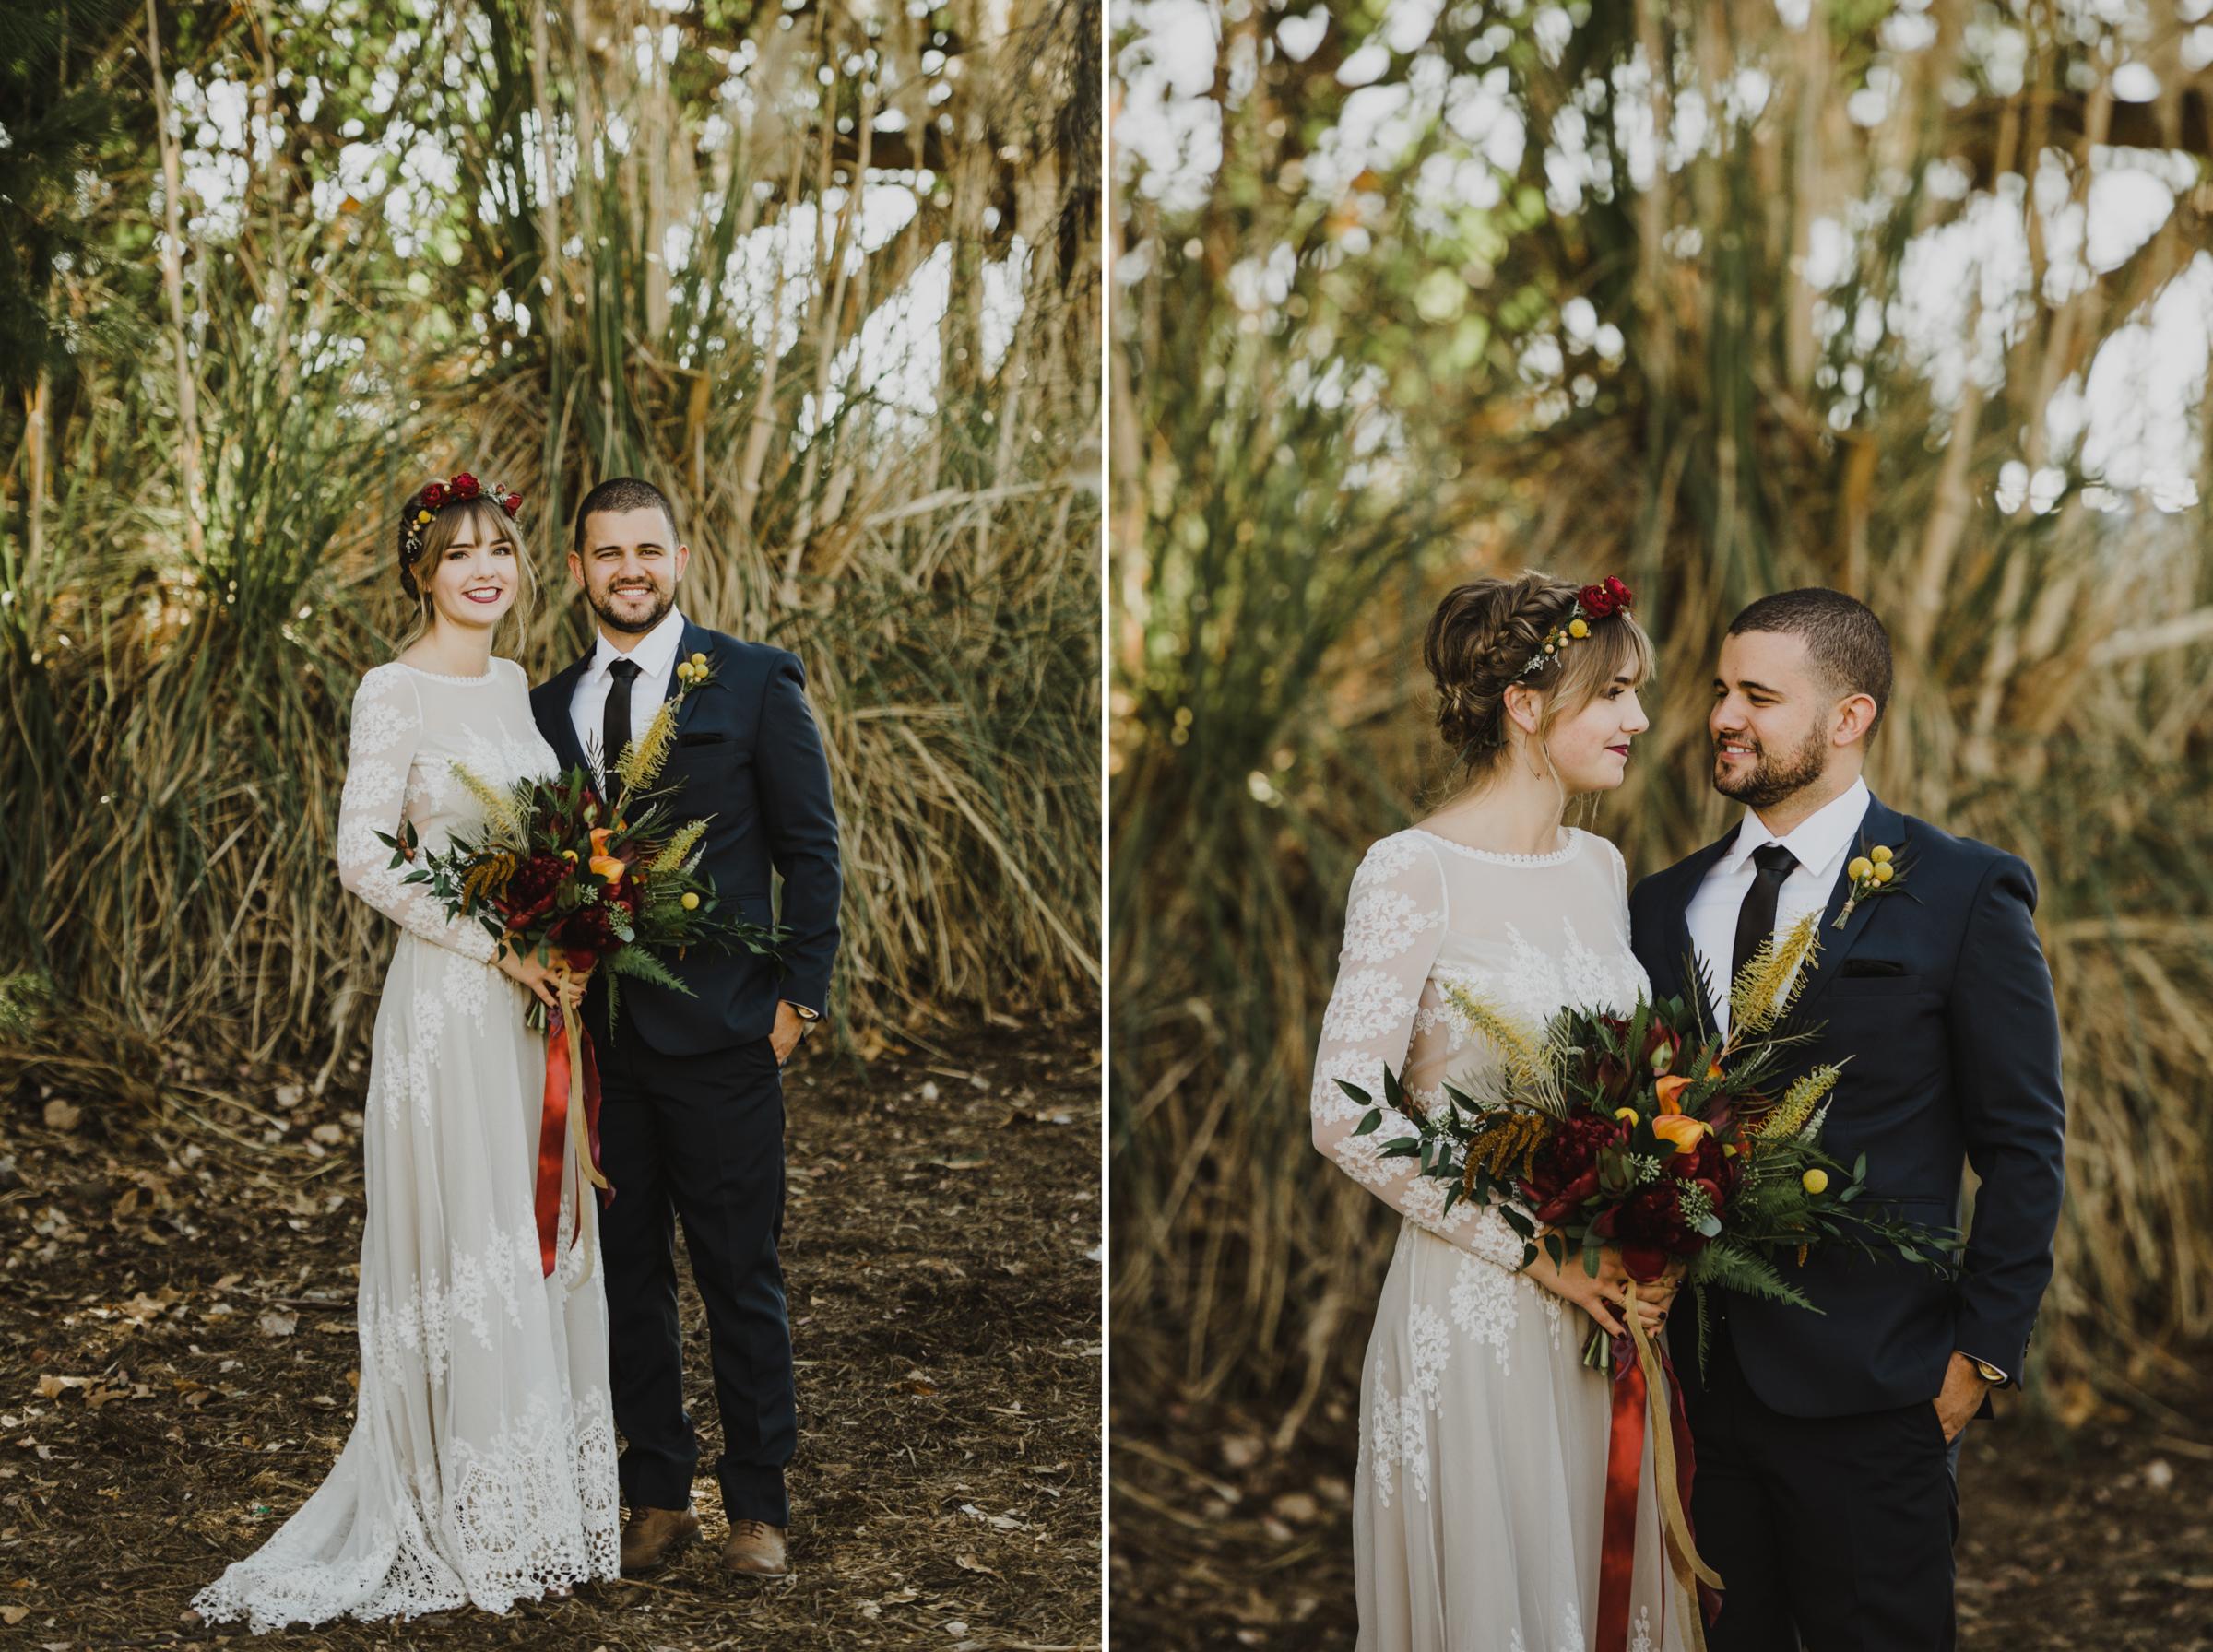 ©Isaiah + Taylor Photography - The Woodshed Booze Brothers Wedding, Vista California Wedding Photographer-39.jpg